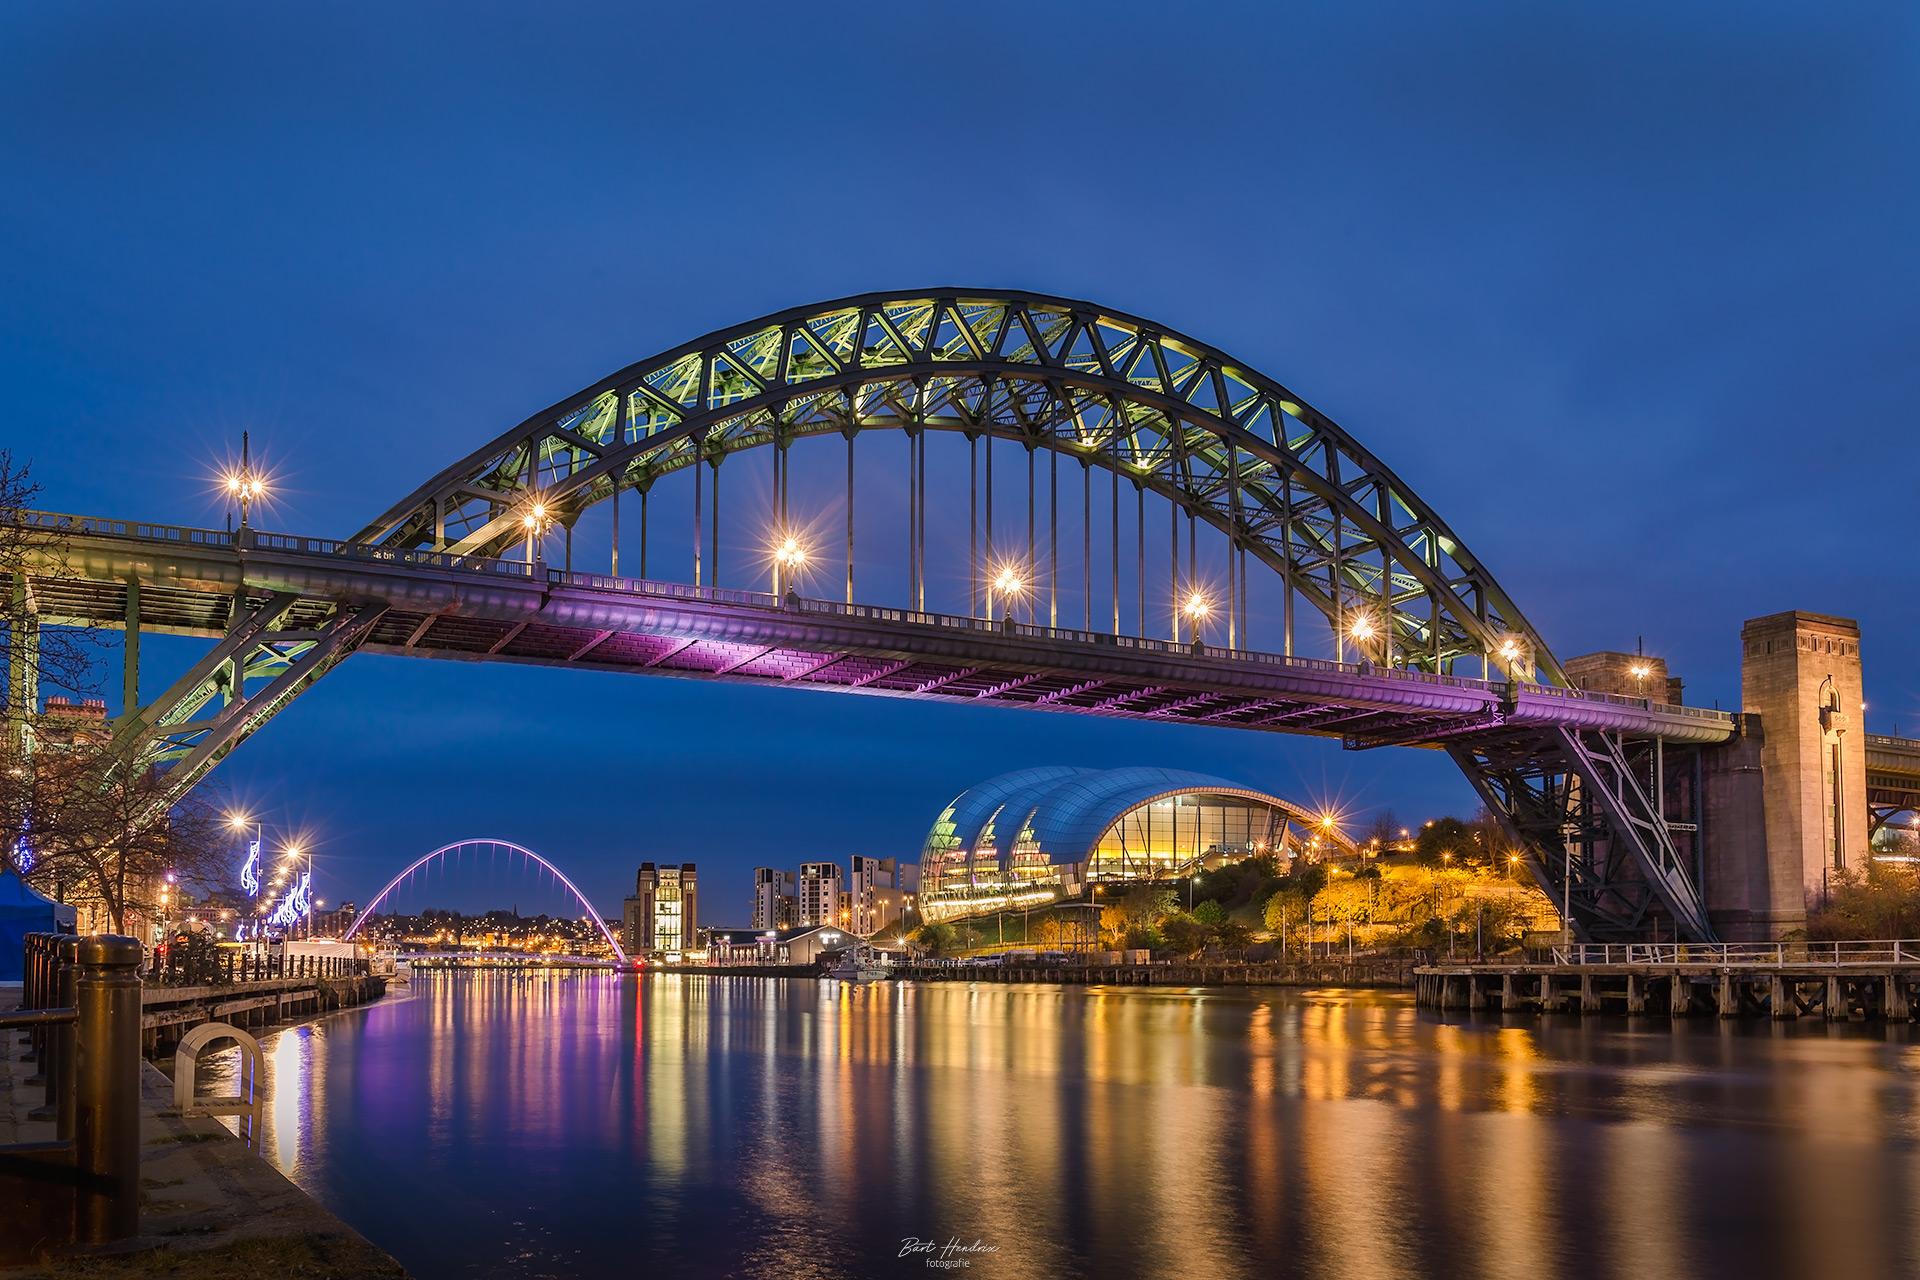 De Tyne Bridge in Newcastle fotograferen